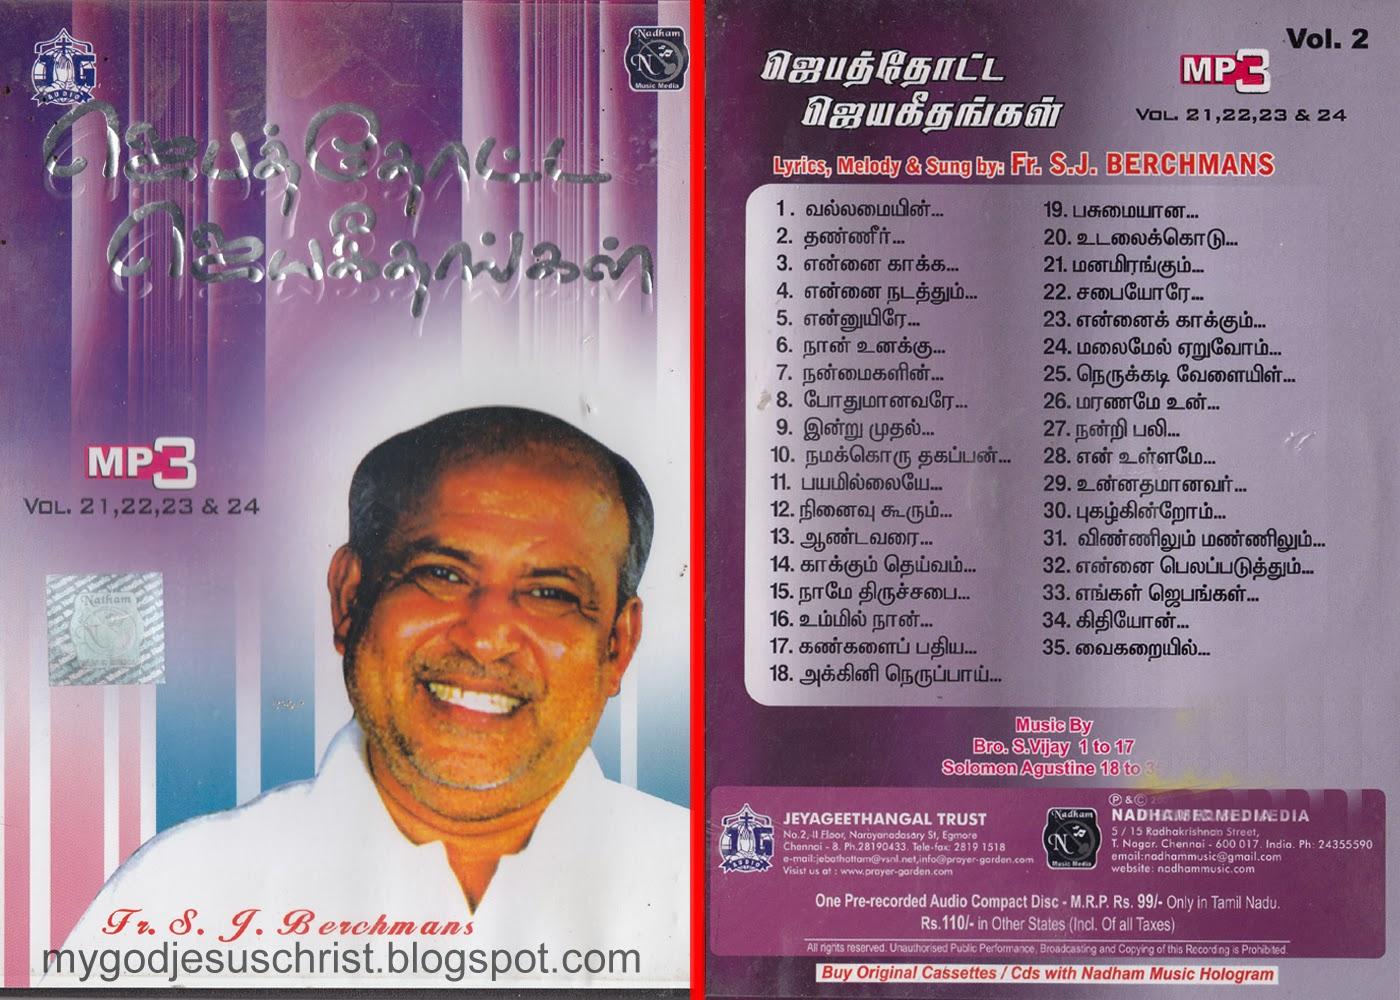 tamil melody mp3 songs download starmusiq